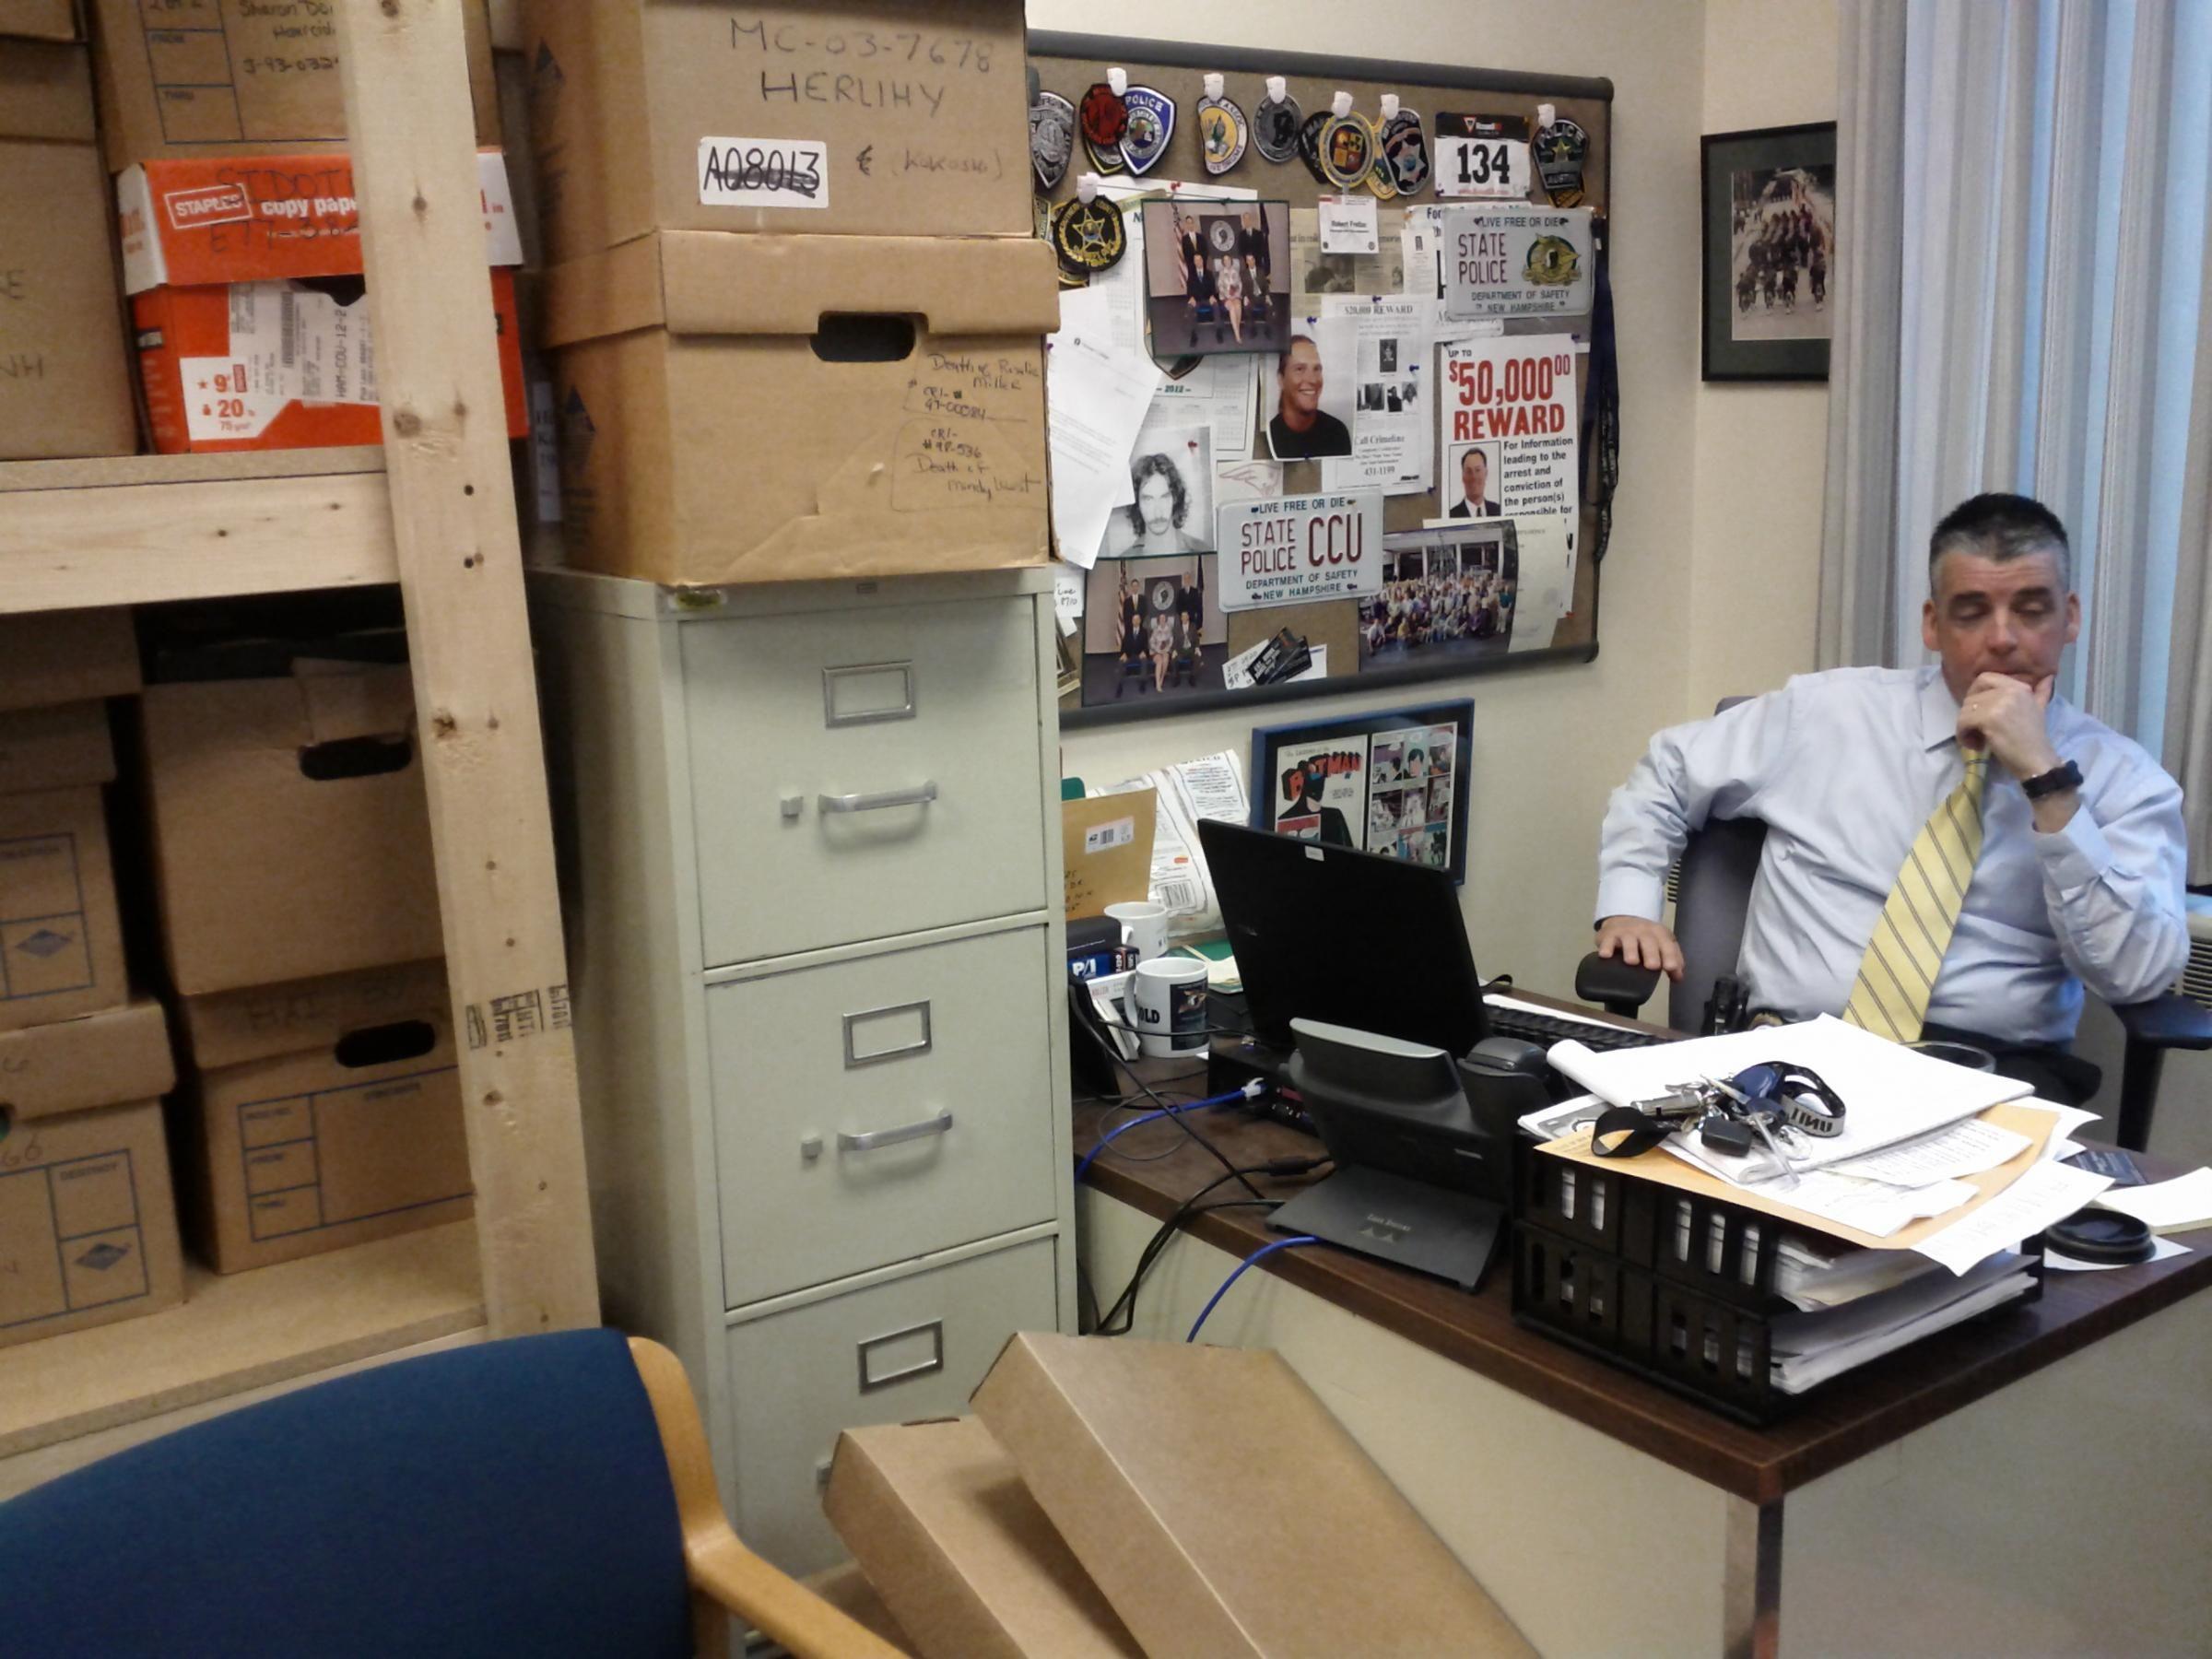 Pin by Natt Bayona on PIGMENTOO   Desk, Police detective, Police ...